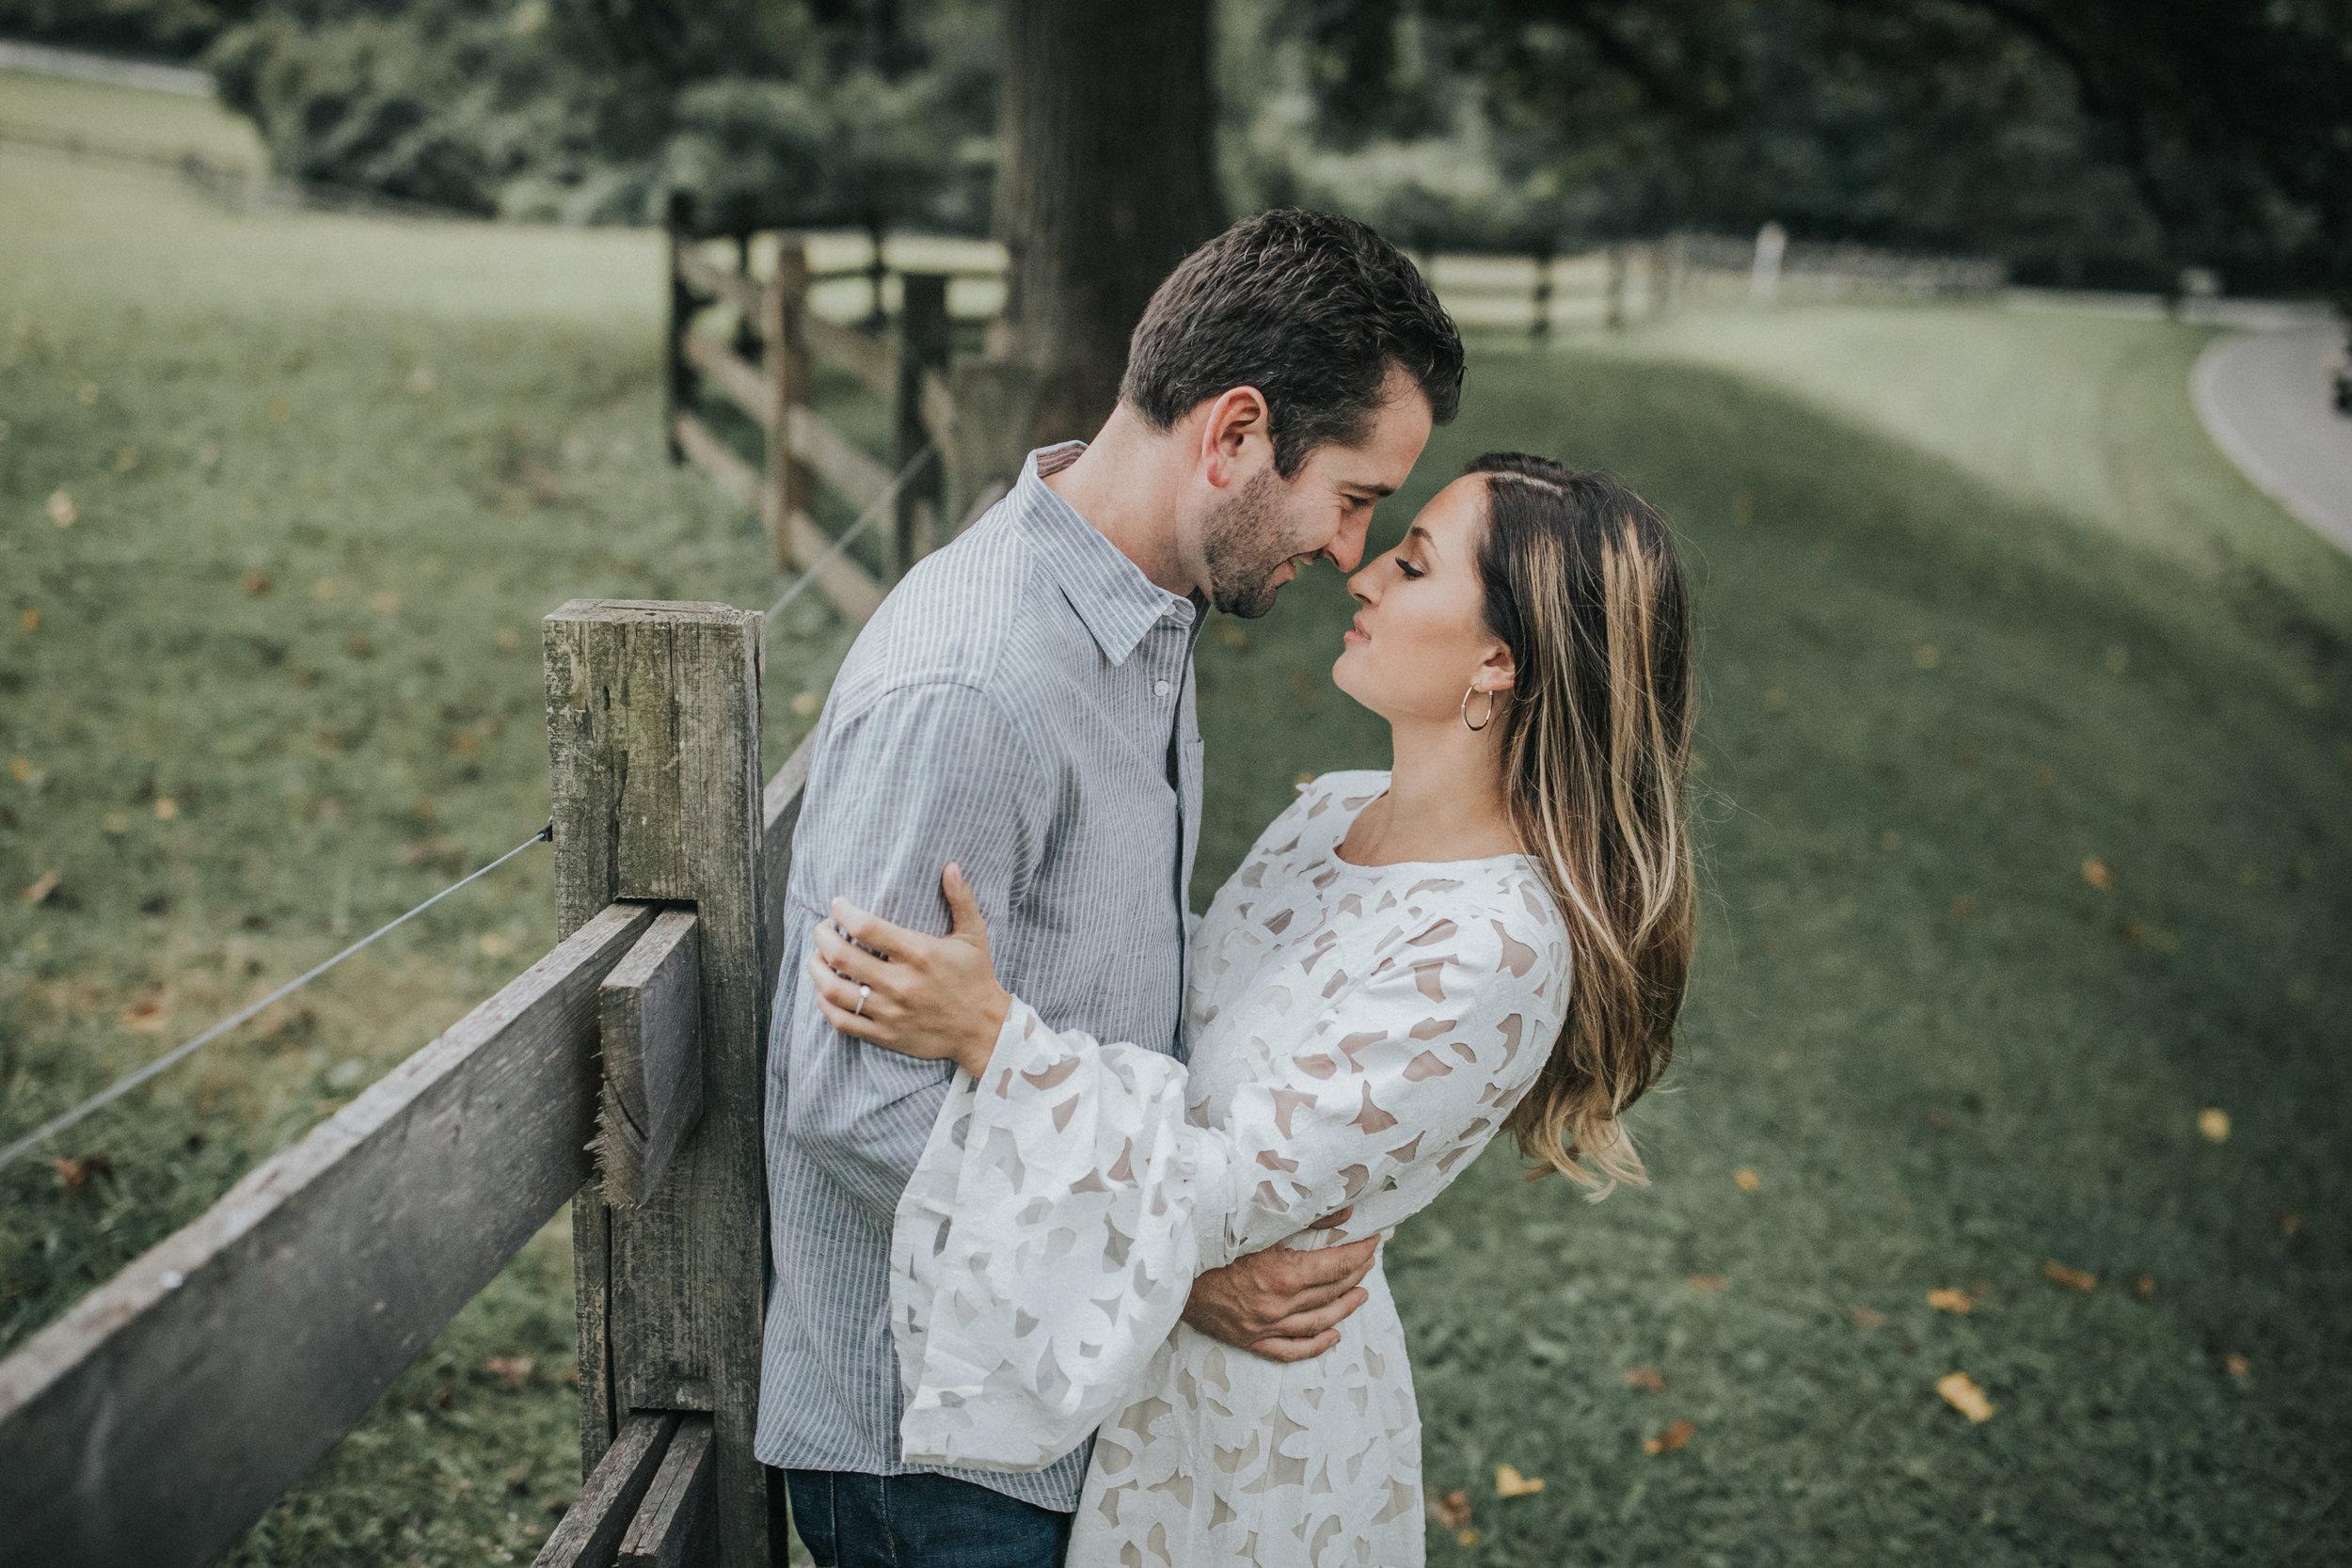 New-Jersey-Wedding-Photography-Engagement-Ridley-Creek-Erika&Chris-6.jpg